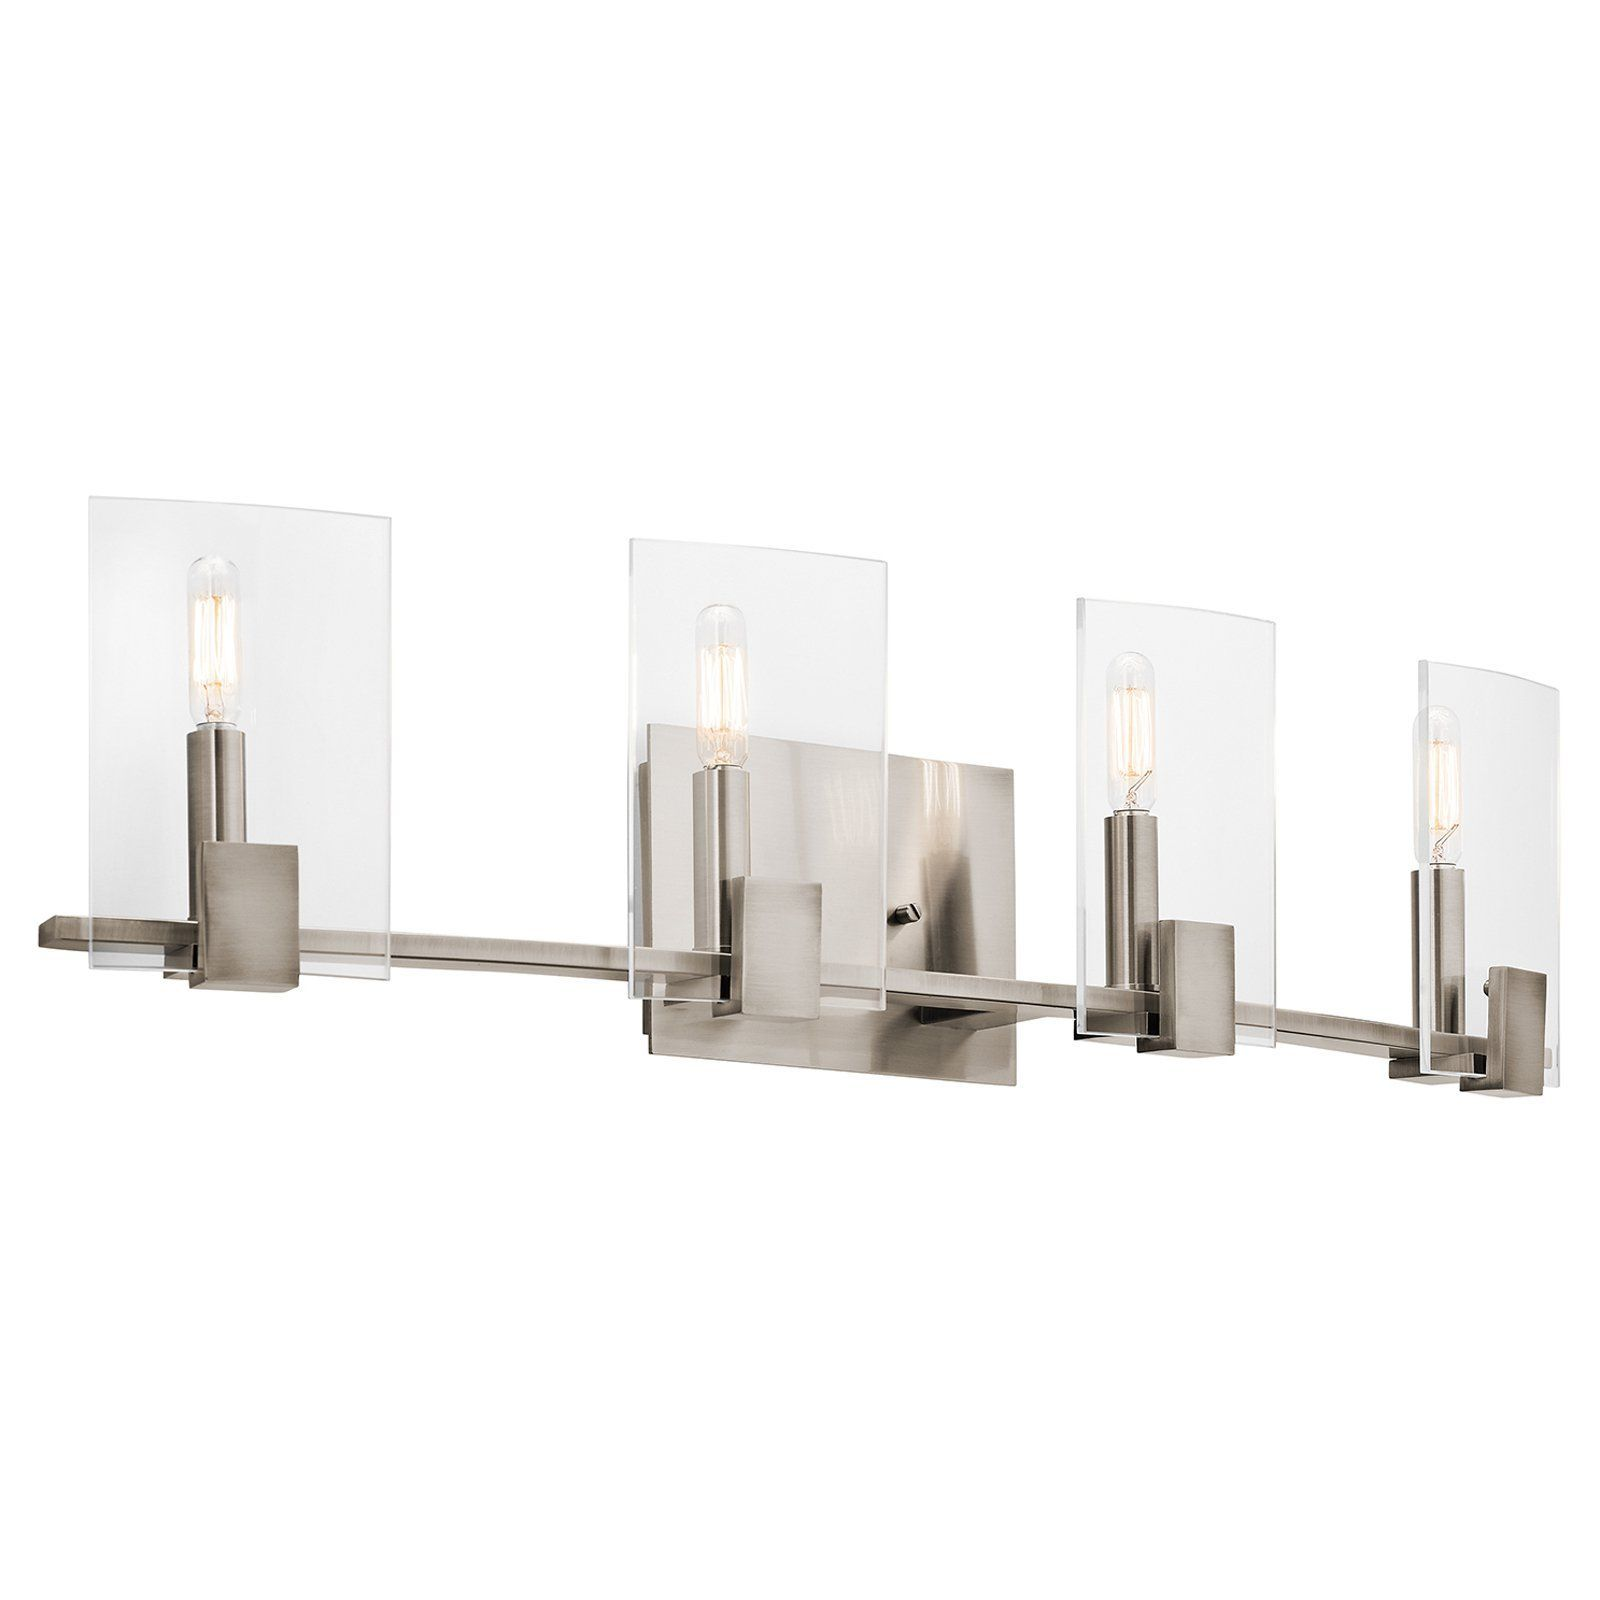 Kichler Signata 45704 Bathroom Vanity Light - 45704NBR